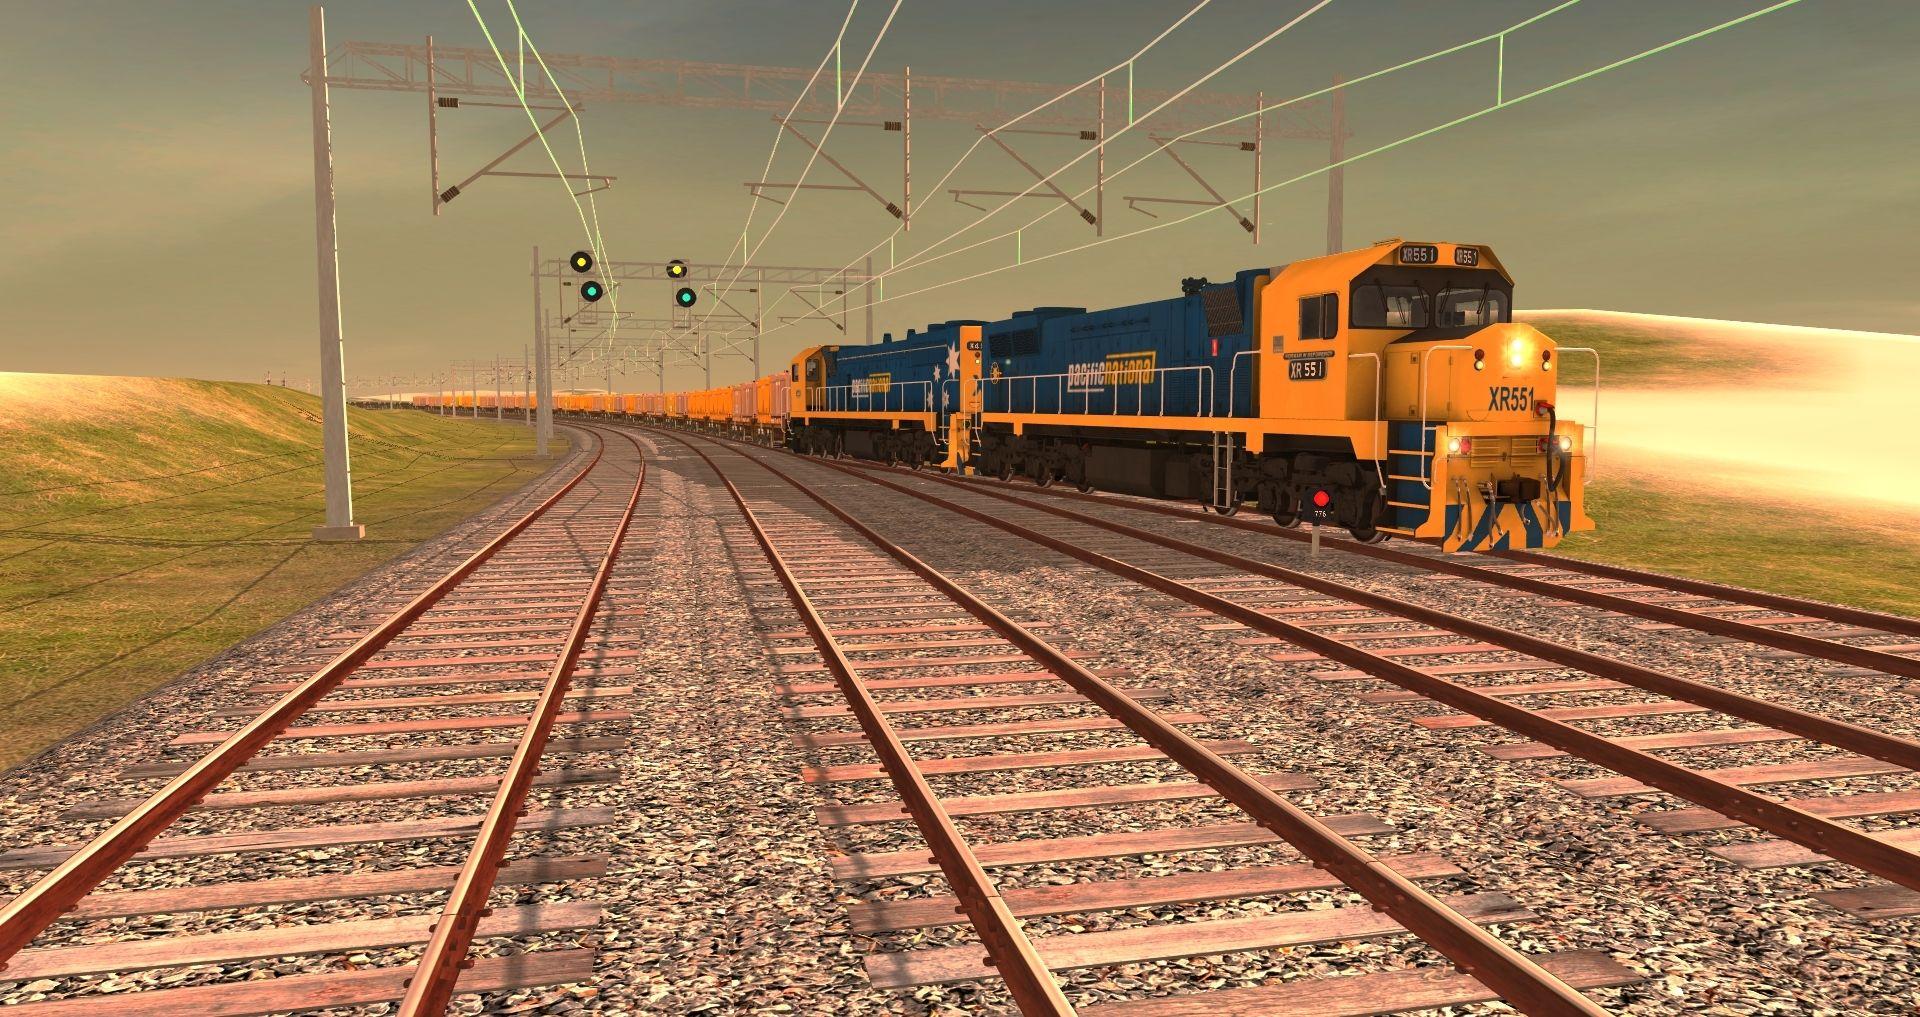 Mods For my first Trainz Set - shared downloads | Channelradar